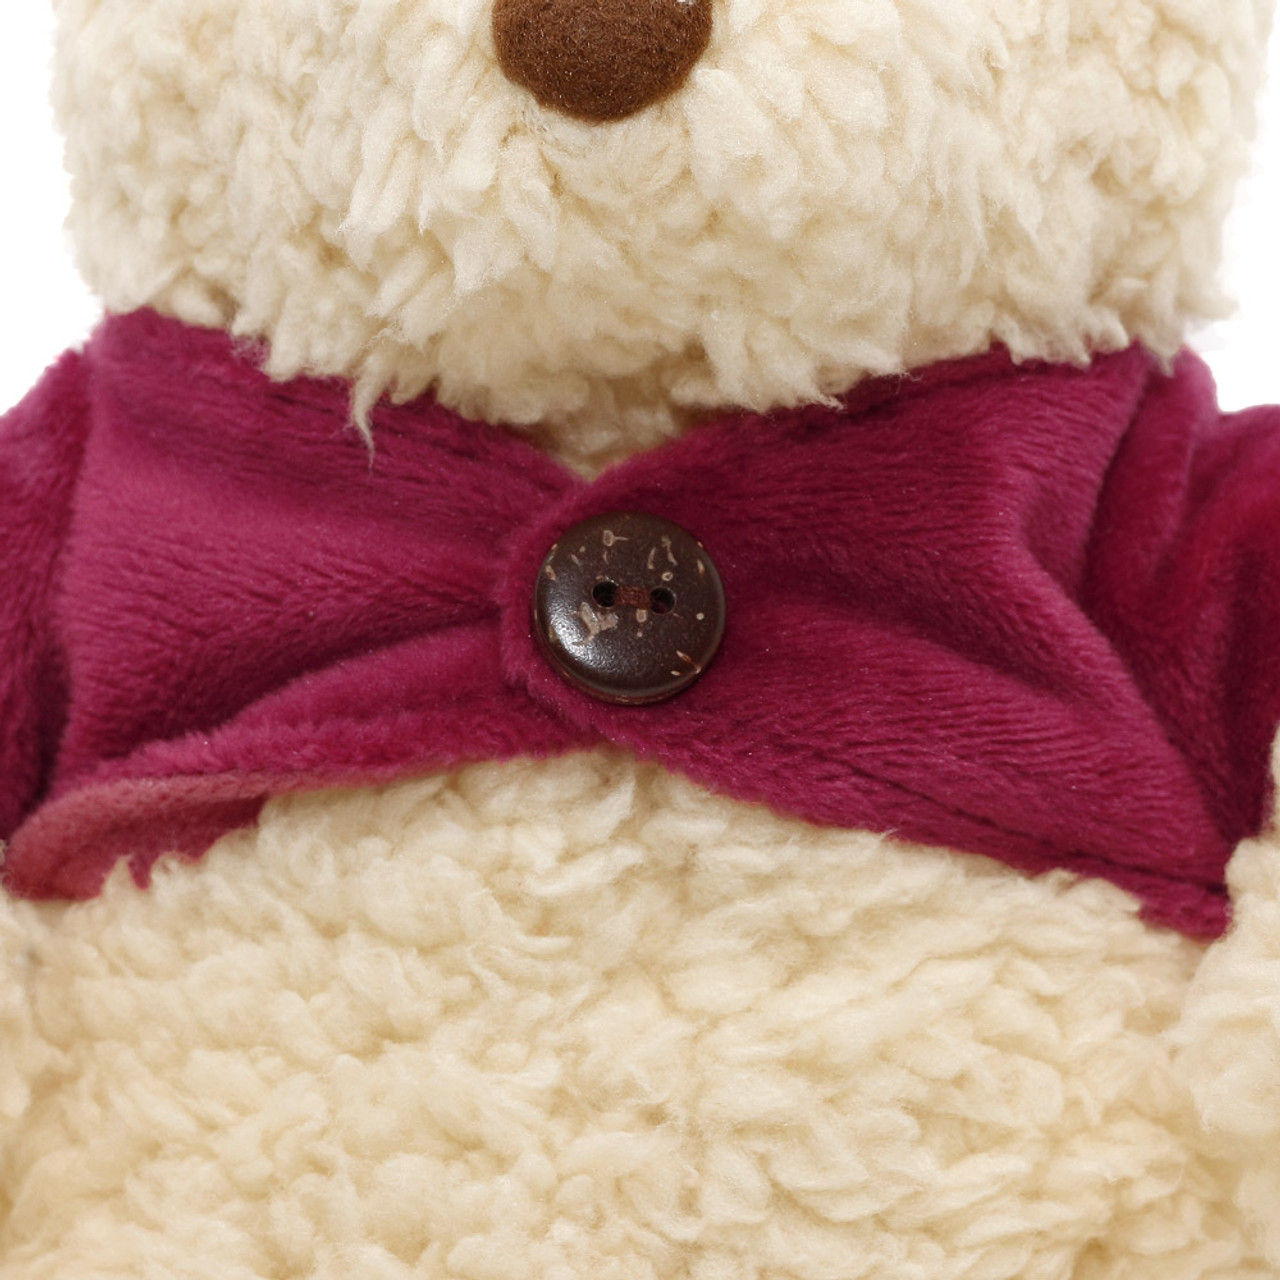 Disney Winnie The Pooh Classic Fluffy Stuffed Animal ( Close-up )